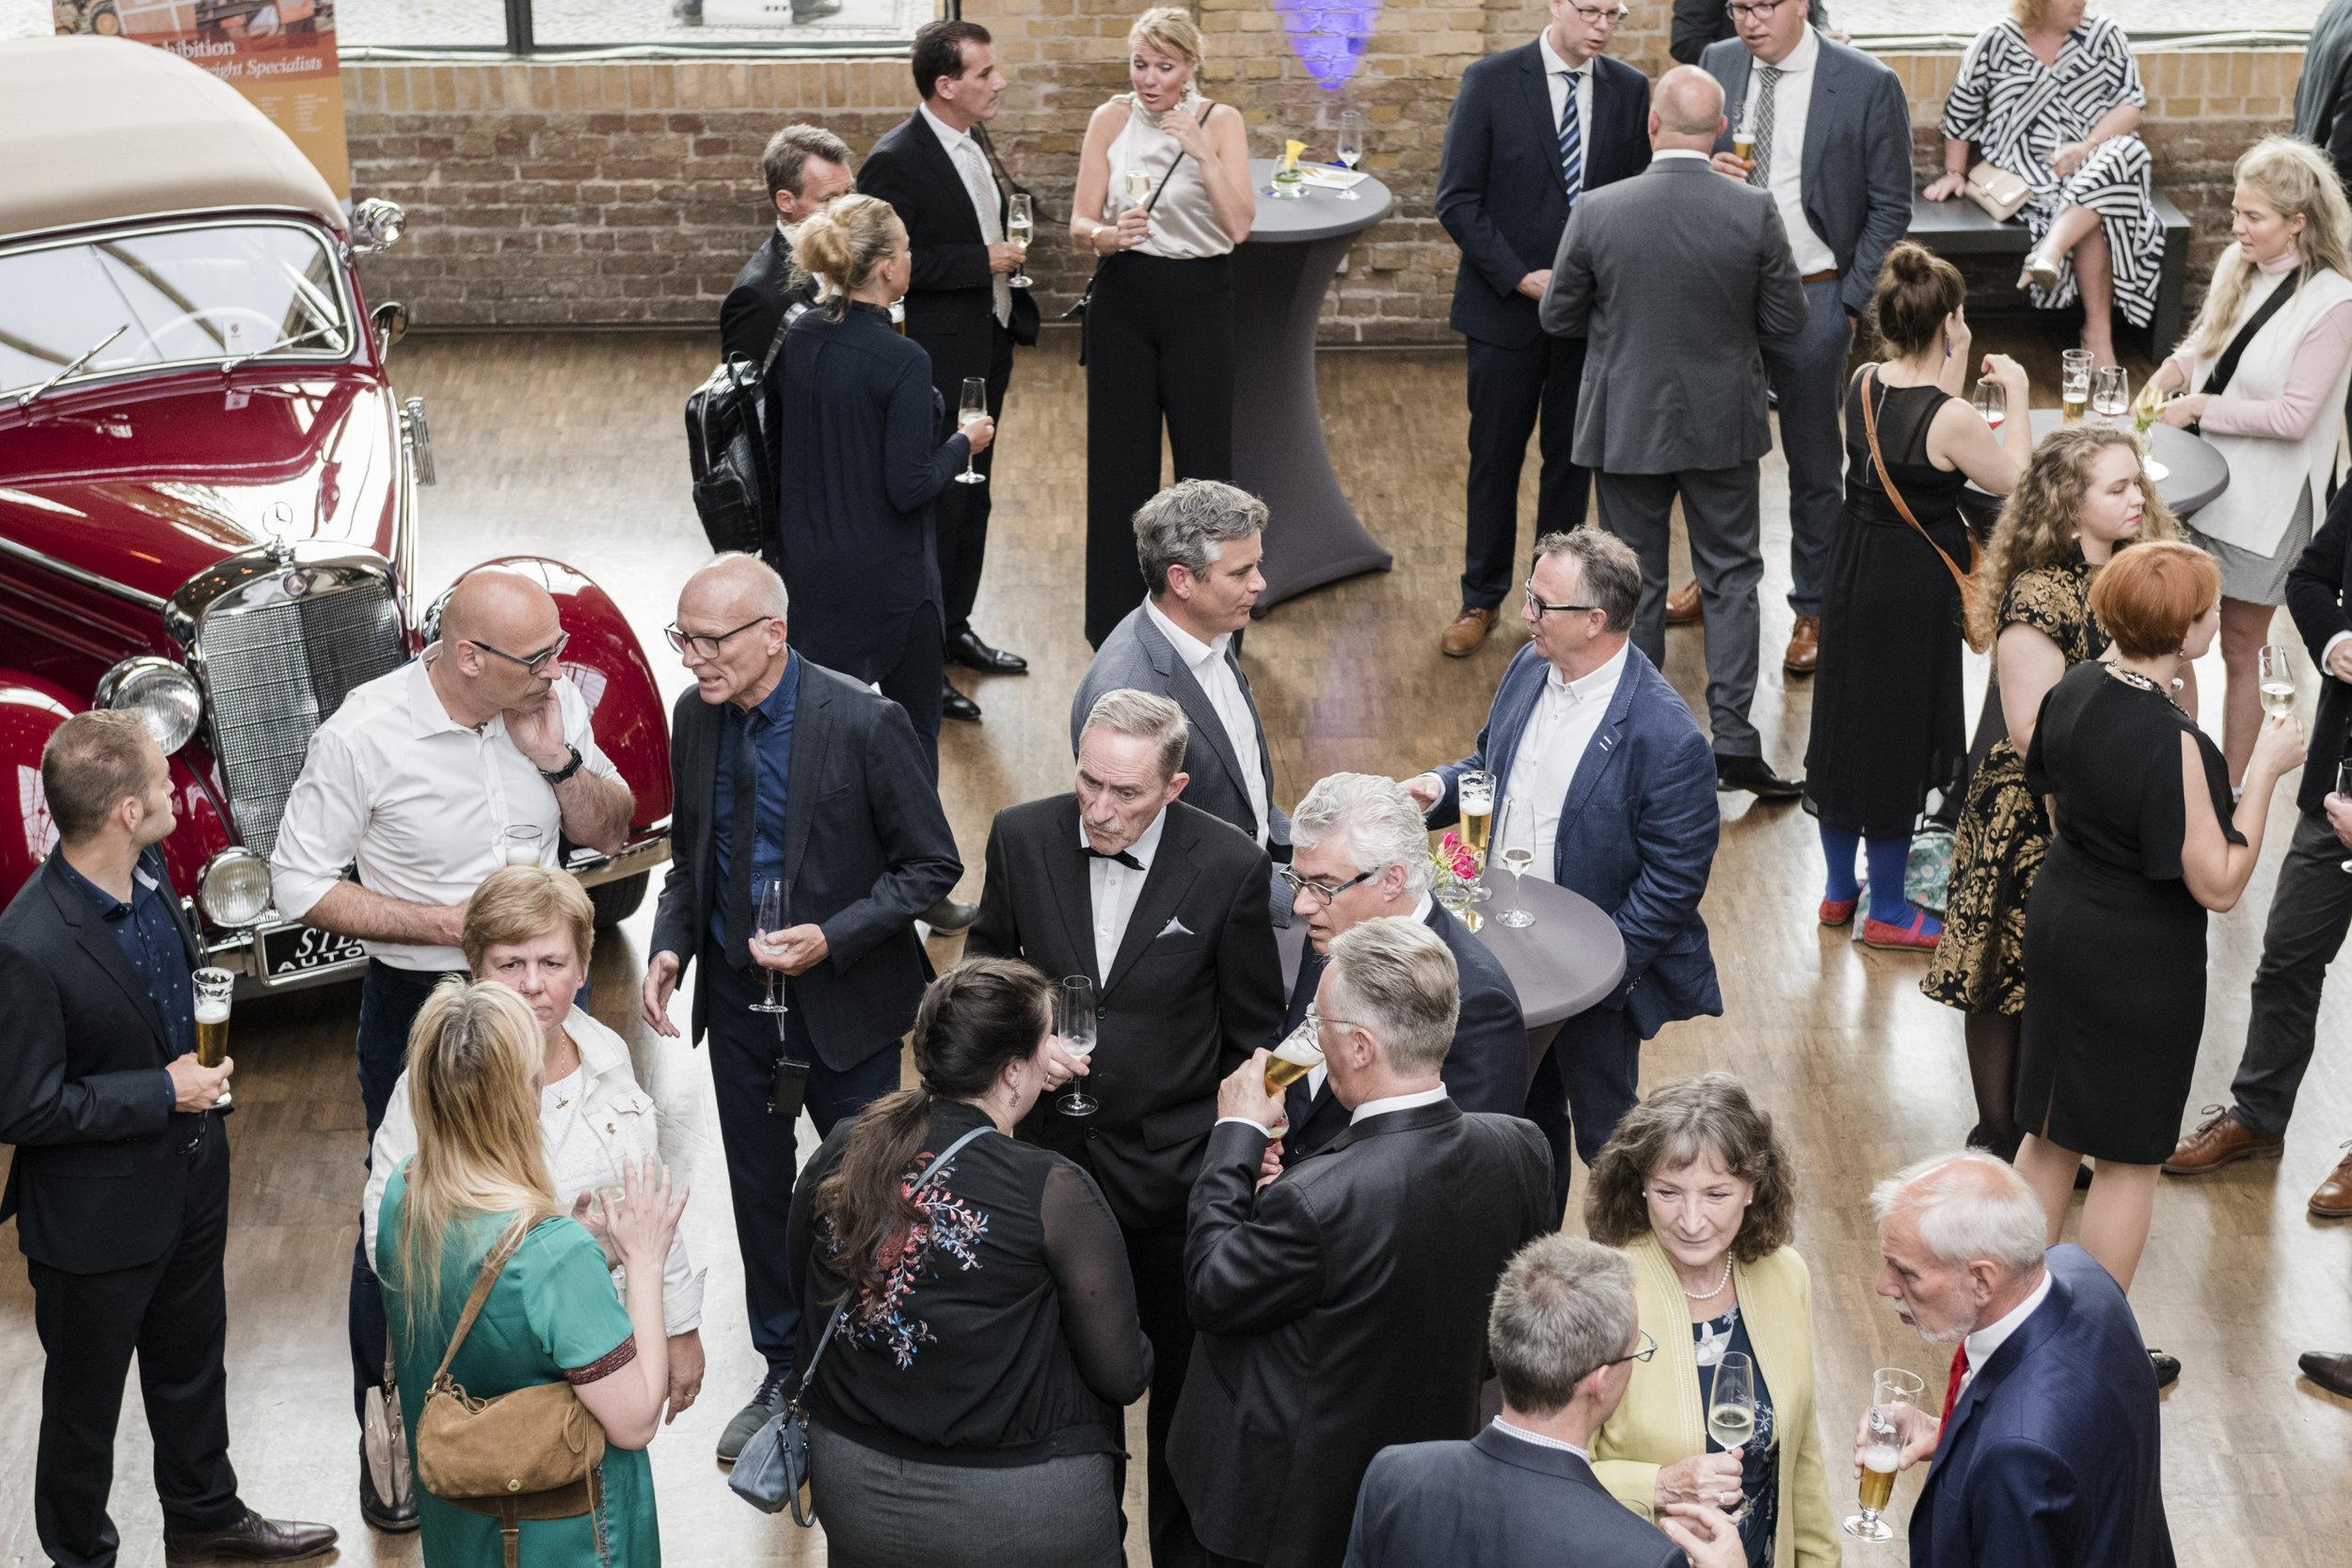 2018-05-16_FESPA_Awards_0032.jpg